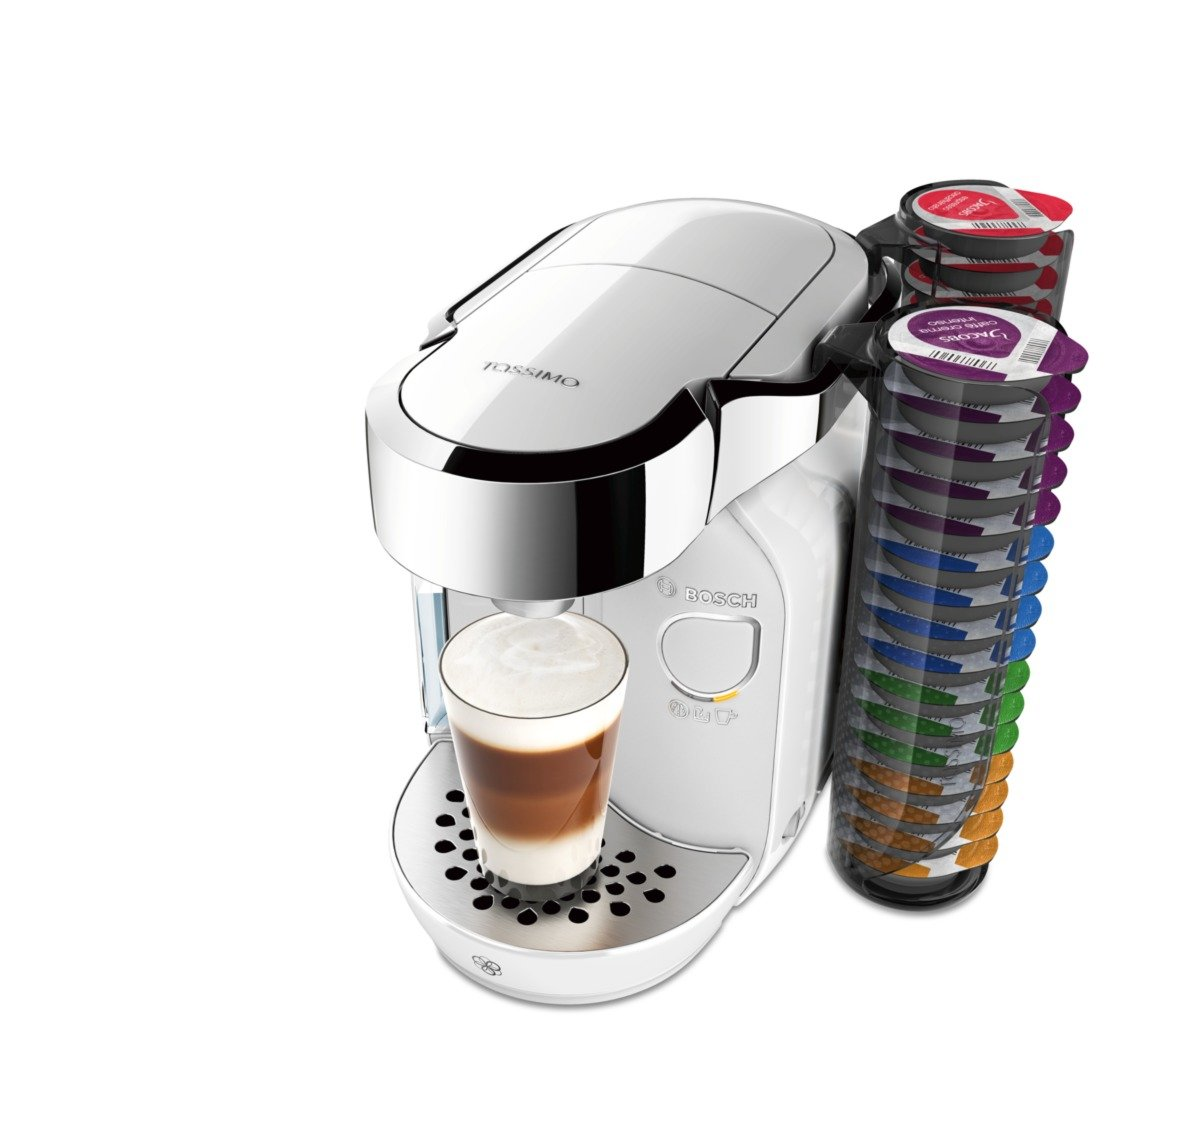 Bosch-Tassimo-Multi-Beverage-Machine-12-Litre-1300-W-33-Bar-Mystical